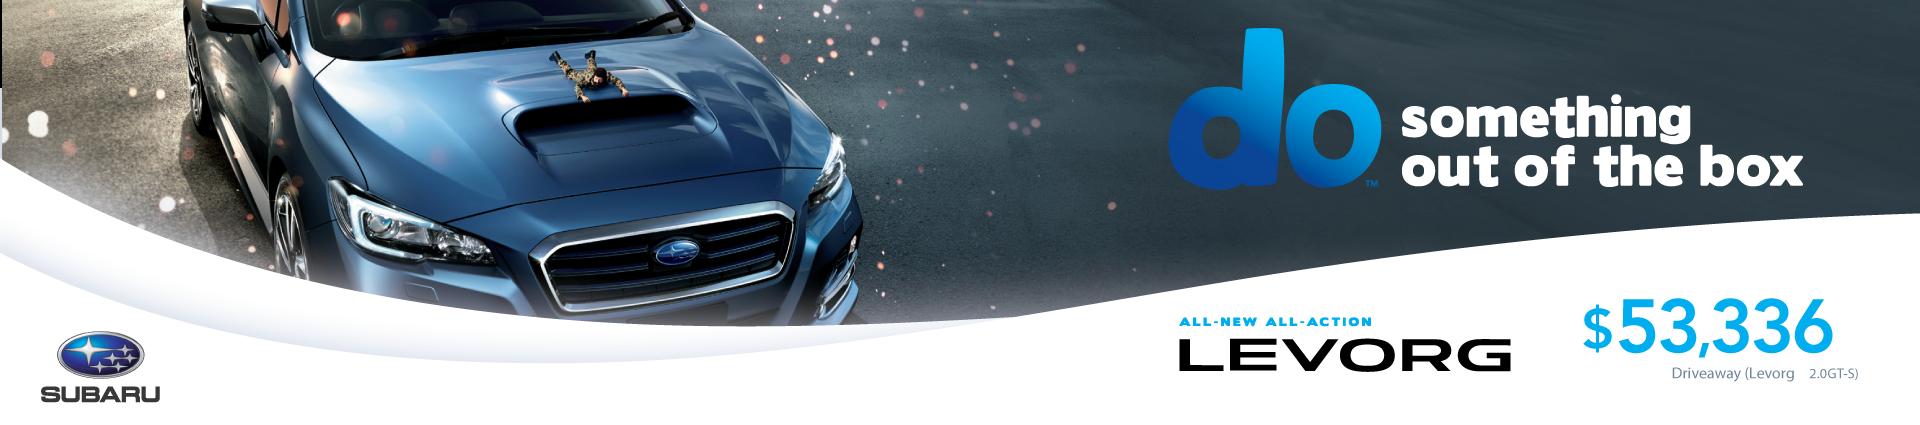 Wippells Subaru | Banner 4